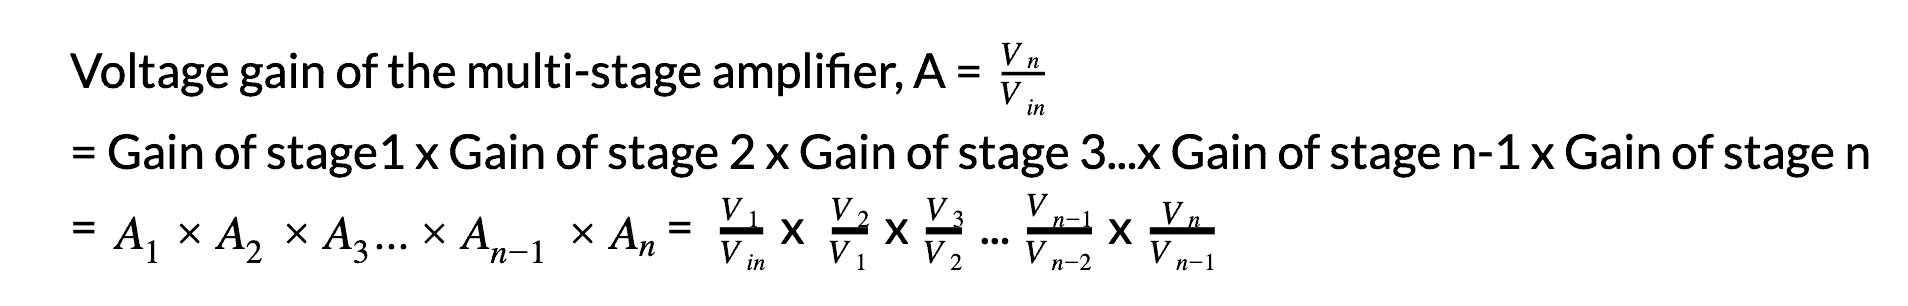 Voltage gain of the multi-stage amplifier, A =VnVin = Gain of stage1 x Gain of stage 2 x Gain of stage 3...x Gain of stage n-1 x Gain of stage n  = A1A2A3...An-1An= V1Vinx V2V1xV3V2...Vn-1Vn-2xVnVn-1